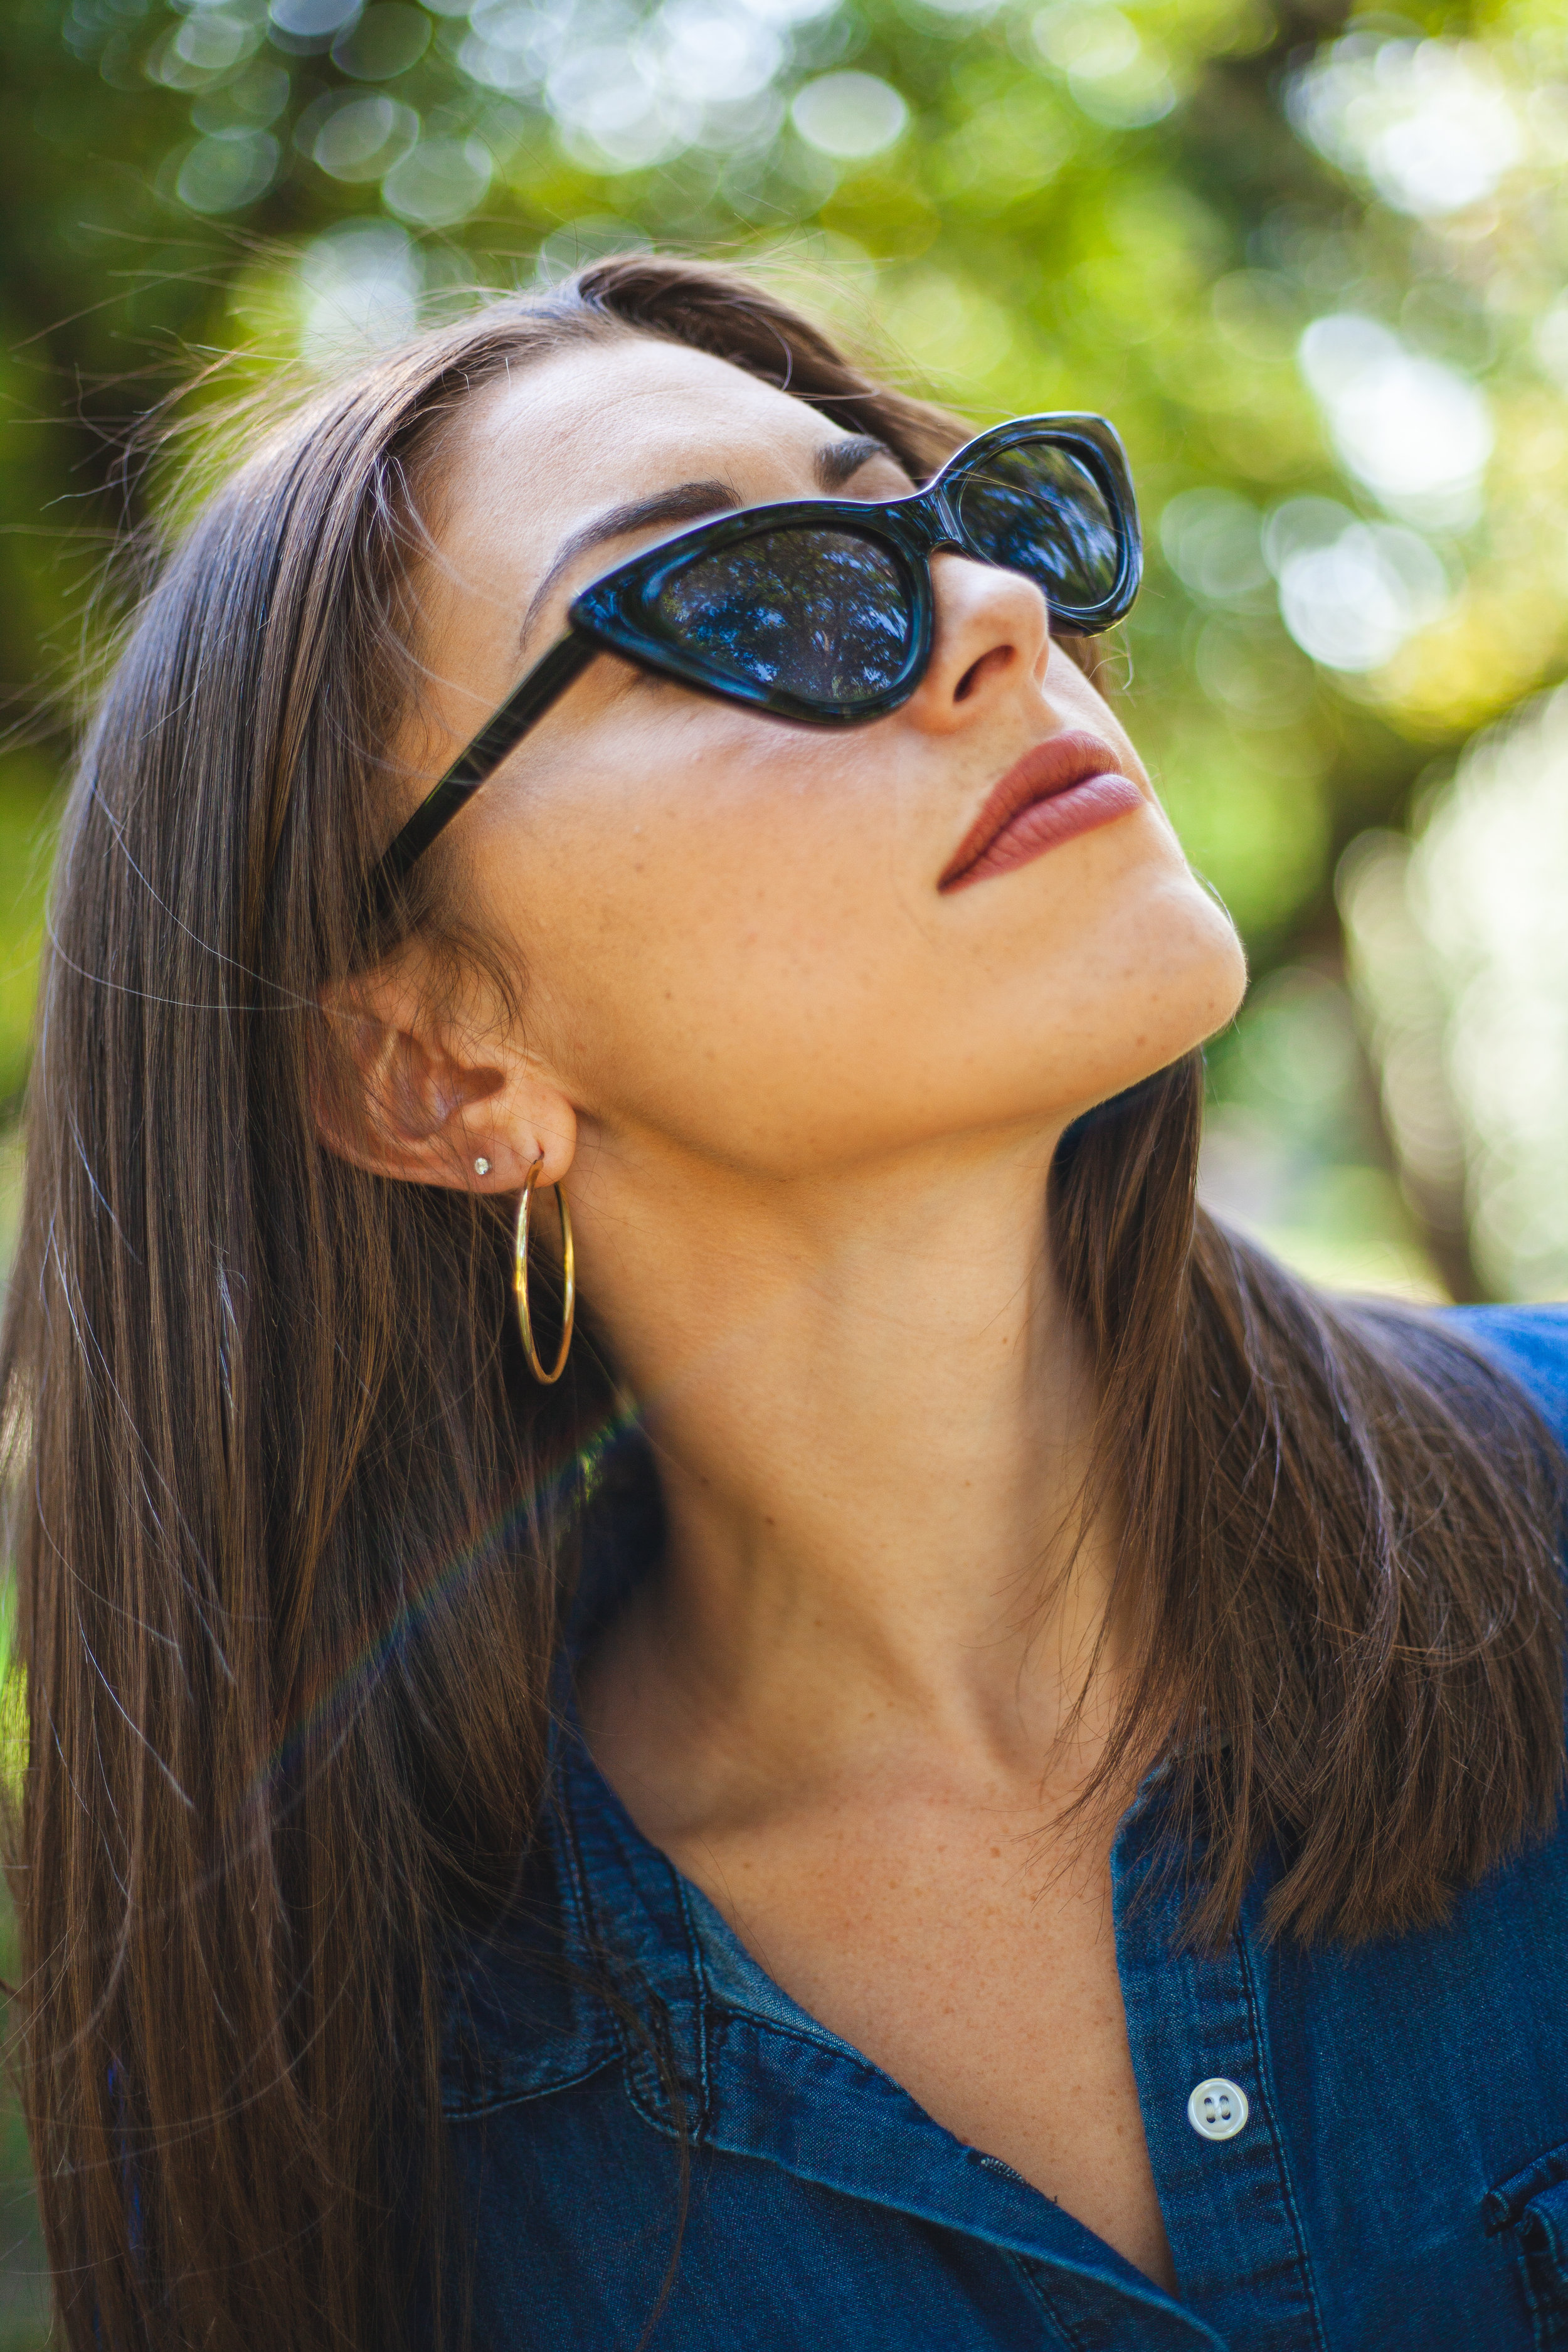 SojoS Clout Goggles Cat Eye  Sunglasses  Vintage Mod Style Retro Kurt Cobain  Sunglasses  SJ2044 with Black Frame/Grey Lens